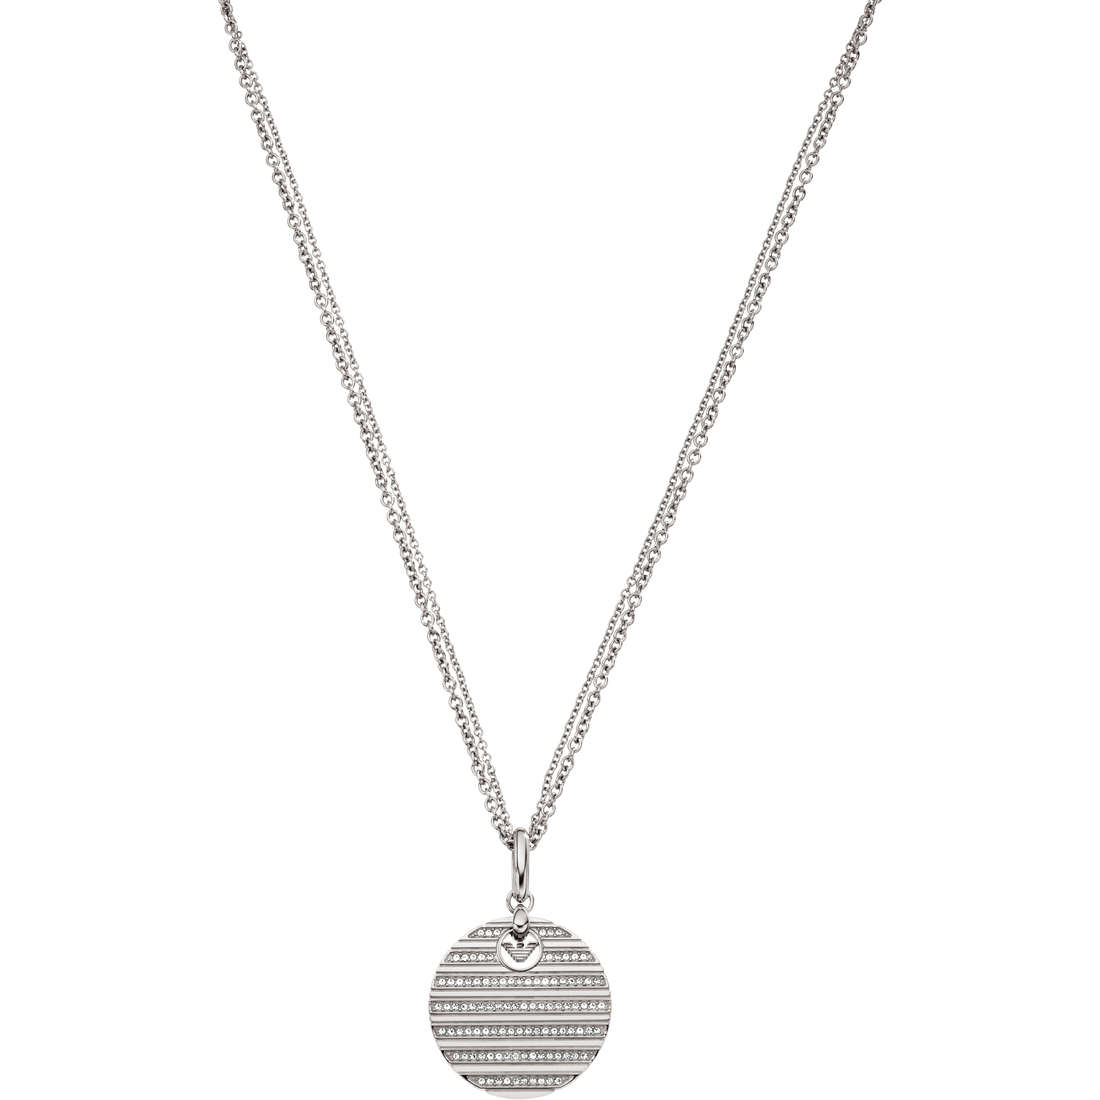 necklace woman jewellery Emporio Armani EGS1671040